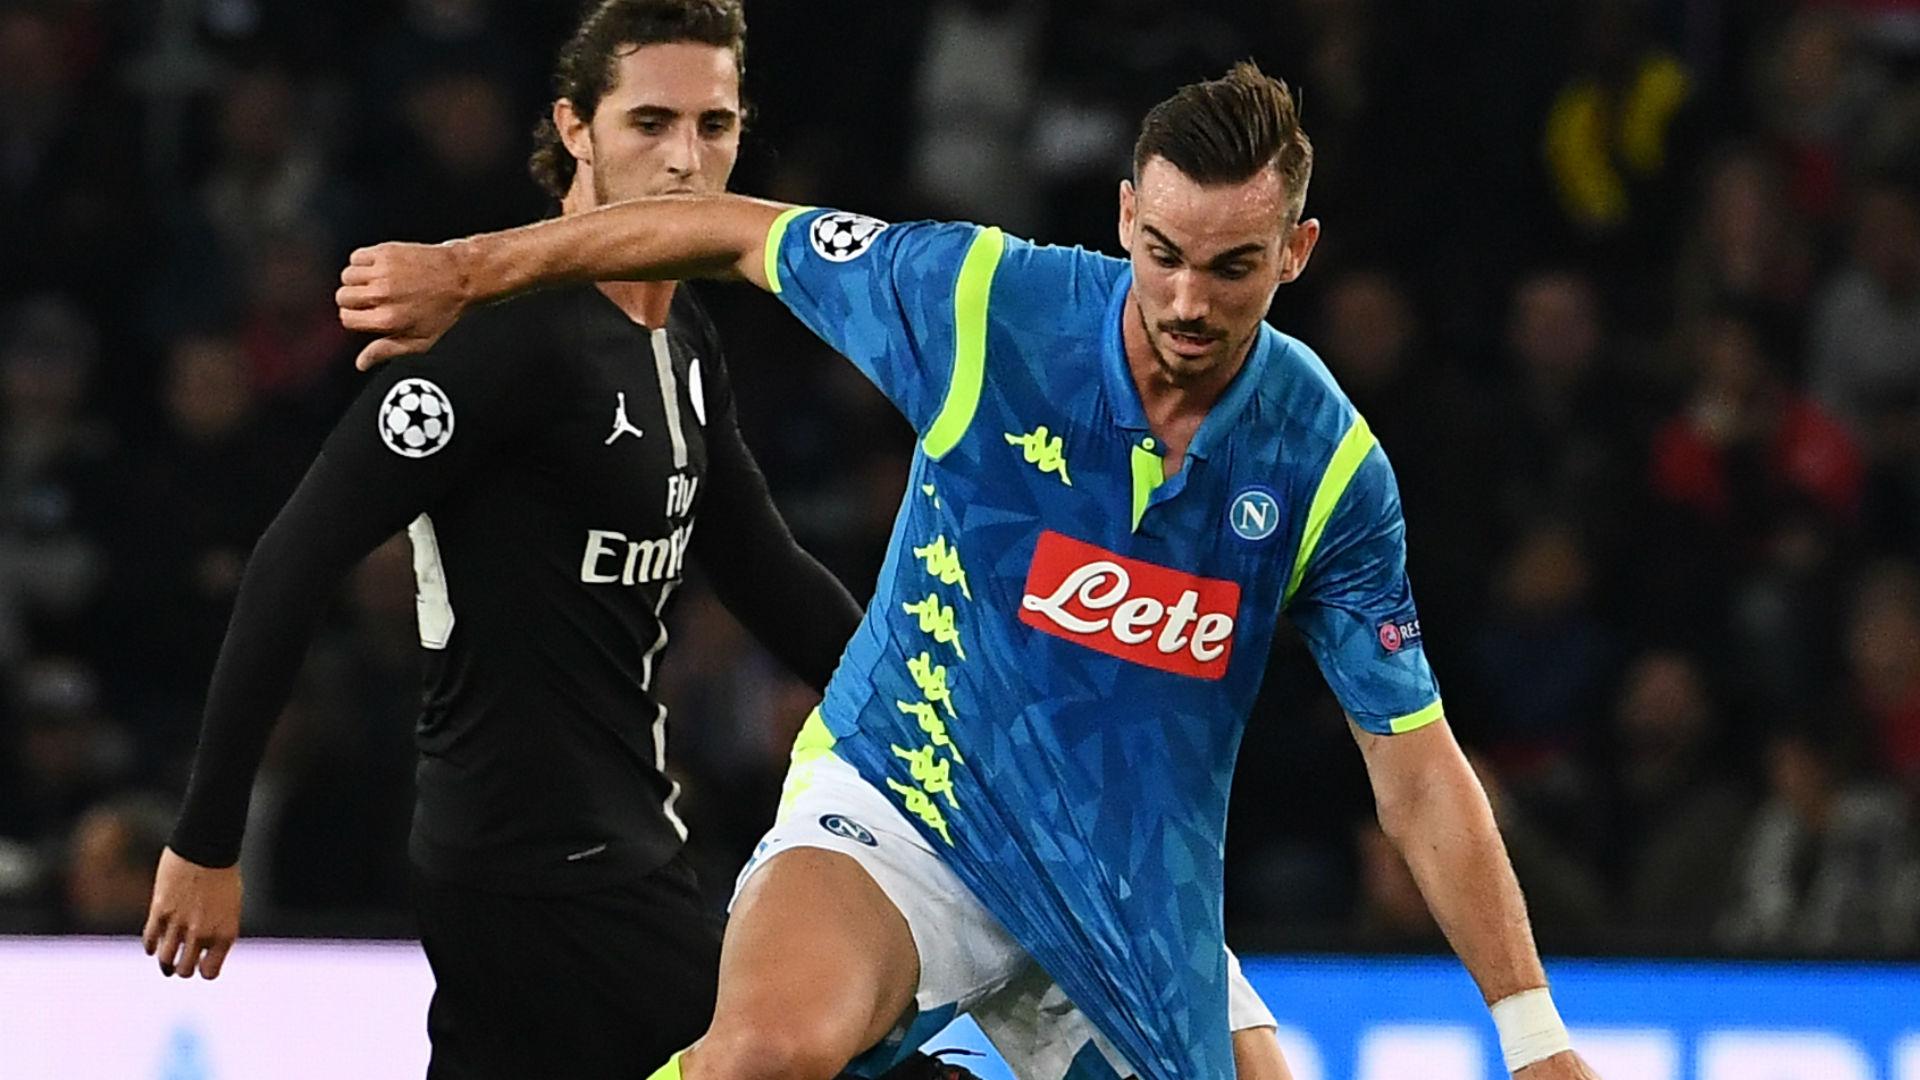 Adrien Rabiot Fabian Ruiz PSG Napoli UEFA Champions League 24102018